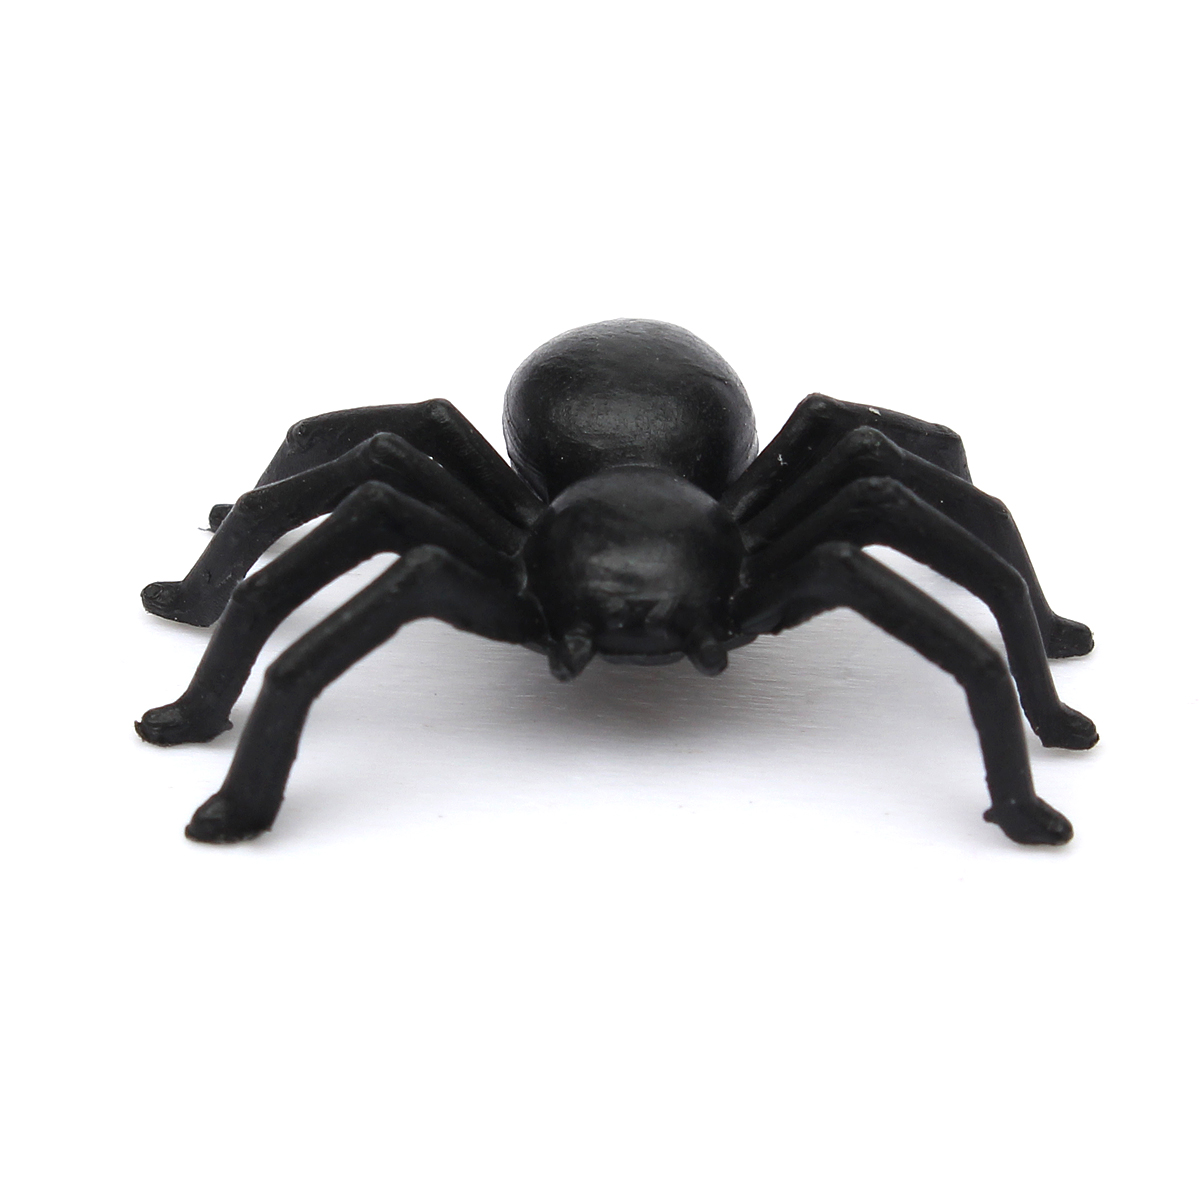 50pcs Halloween Plastic Spiders Spider Funny Joking Toy Decoration